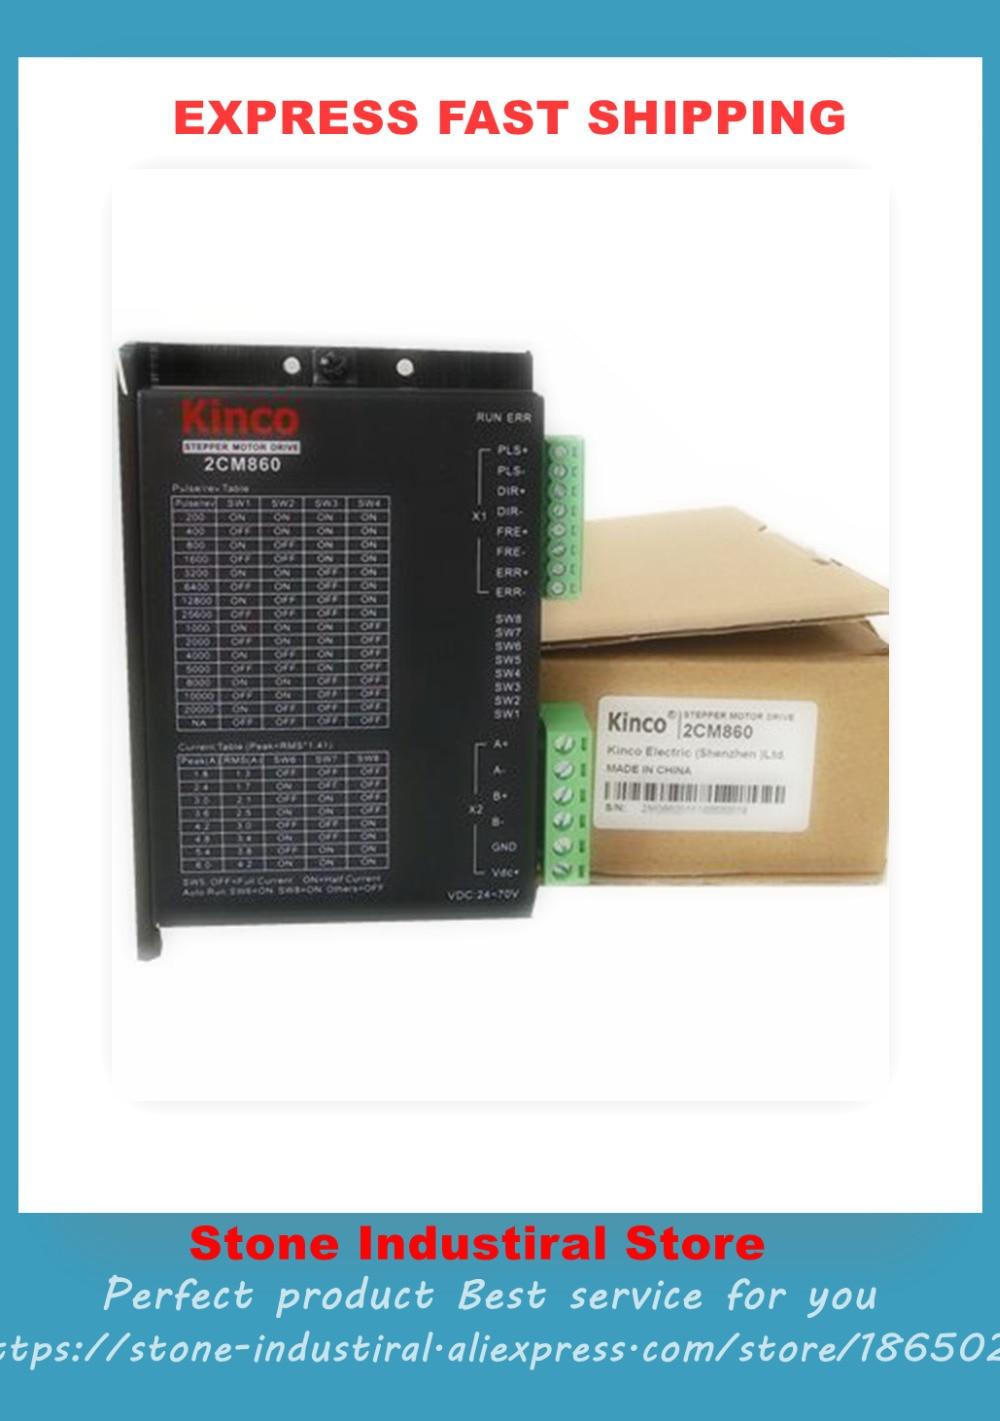 two-phase stepper drive 2CM860 2CM525 2CM545 2CM560 2CM880 new original toothed belt drive motorized stepper motor precision guide rail manufacturer guideway